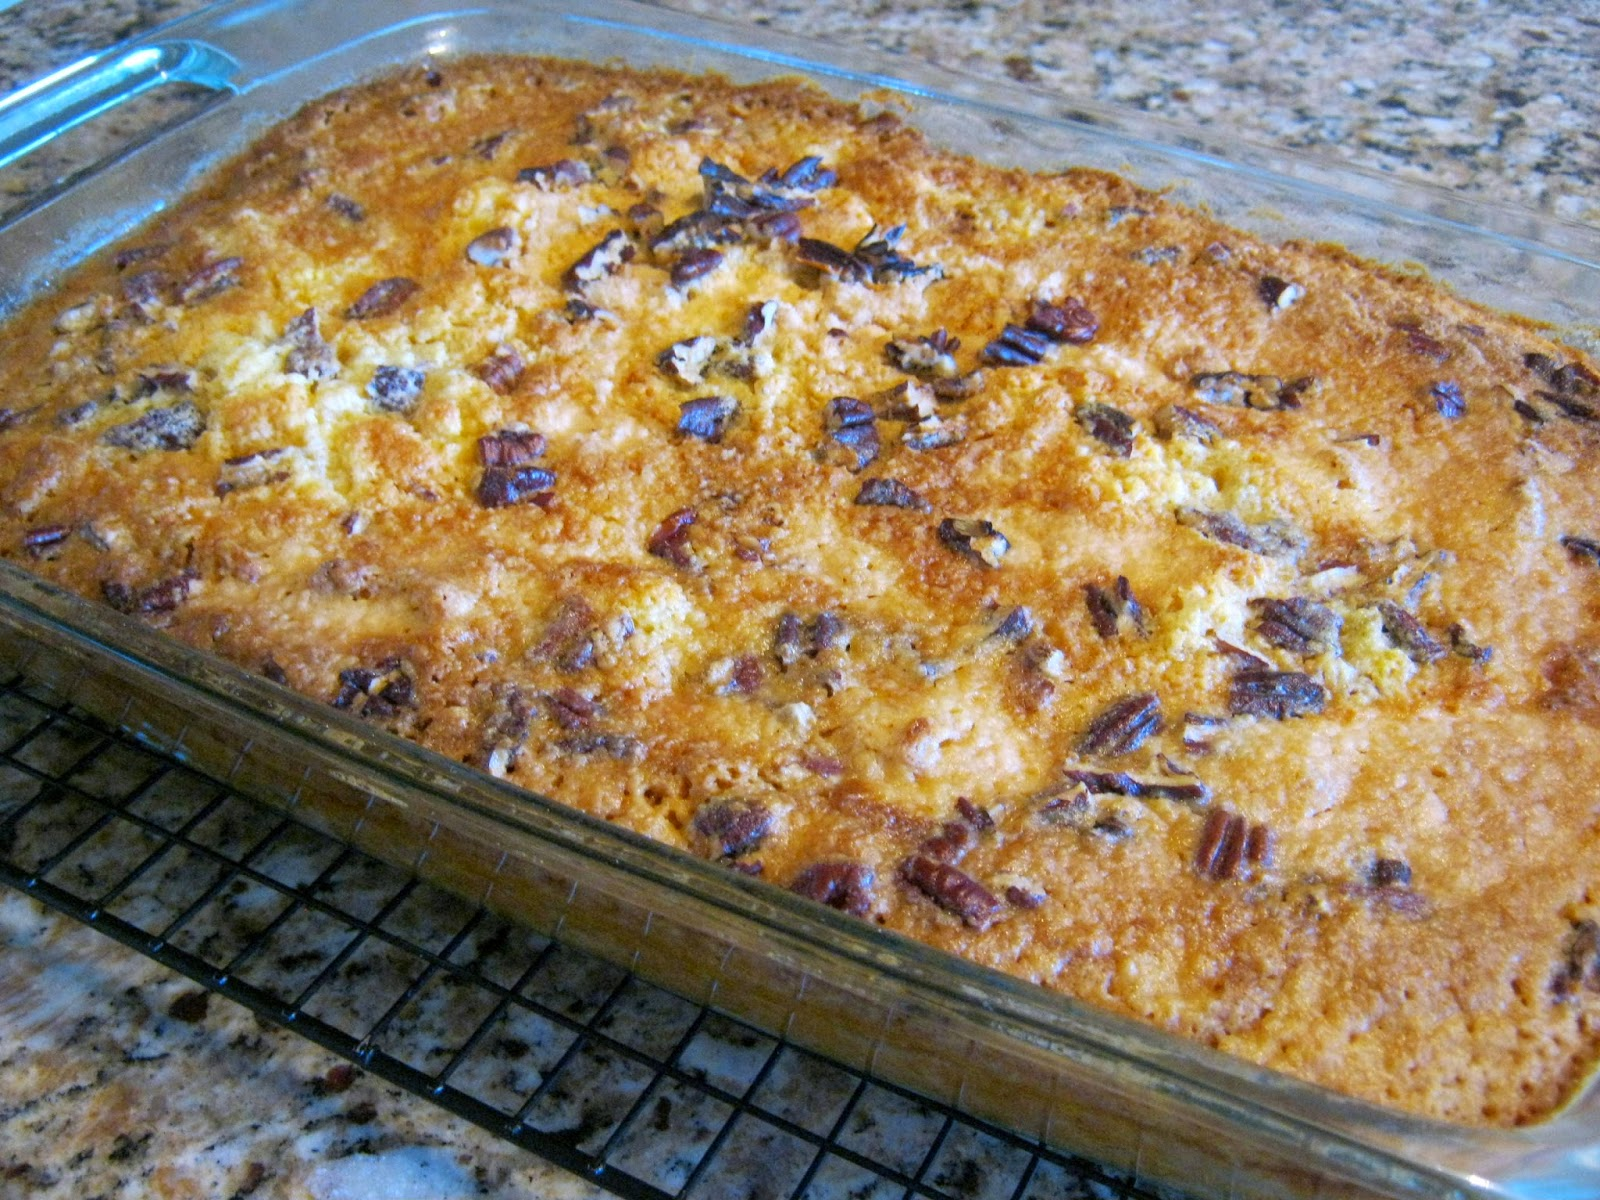 Bake at 350 degrees 50-55 minutes, until golden brown.